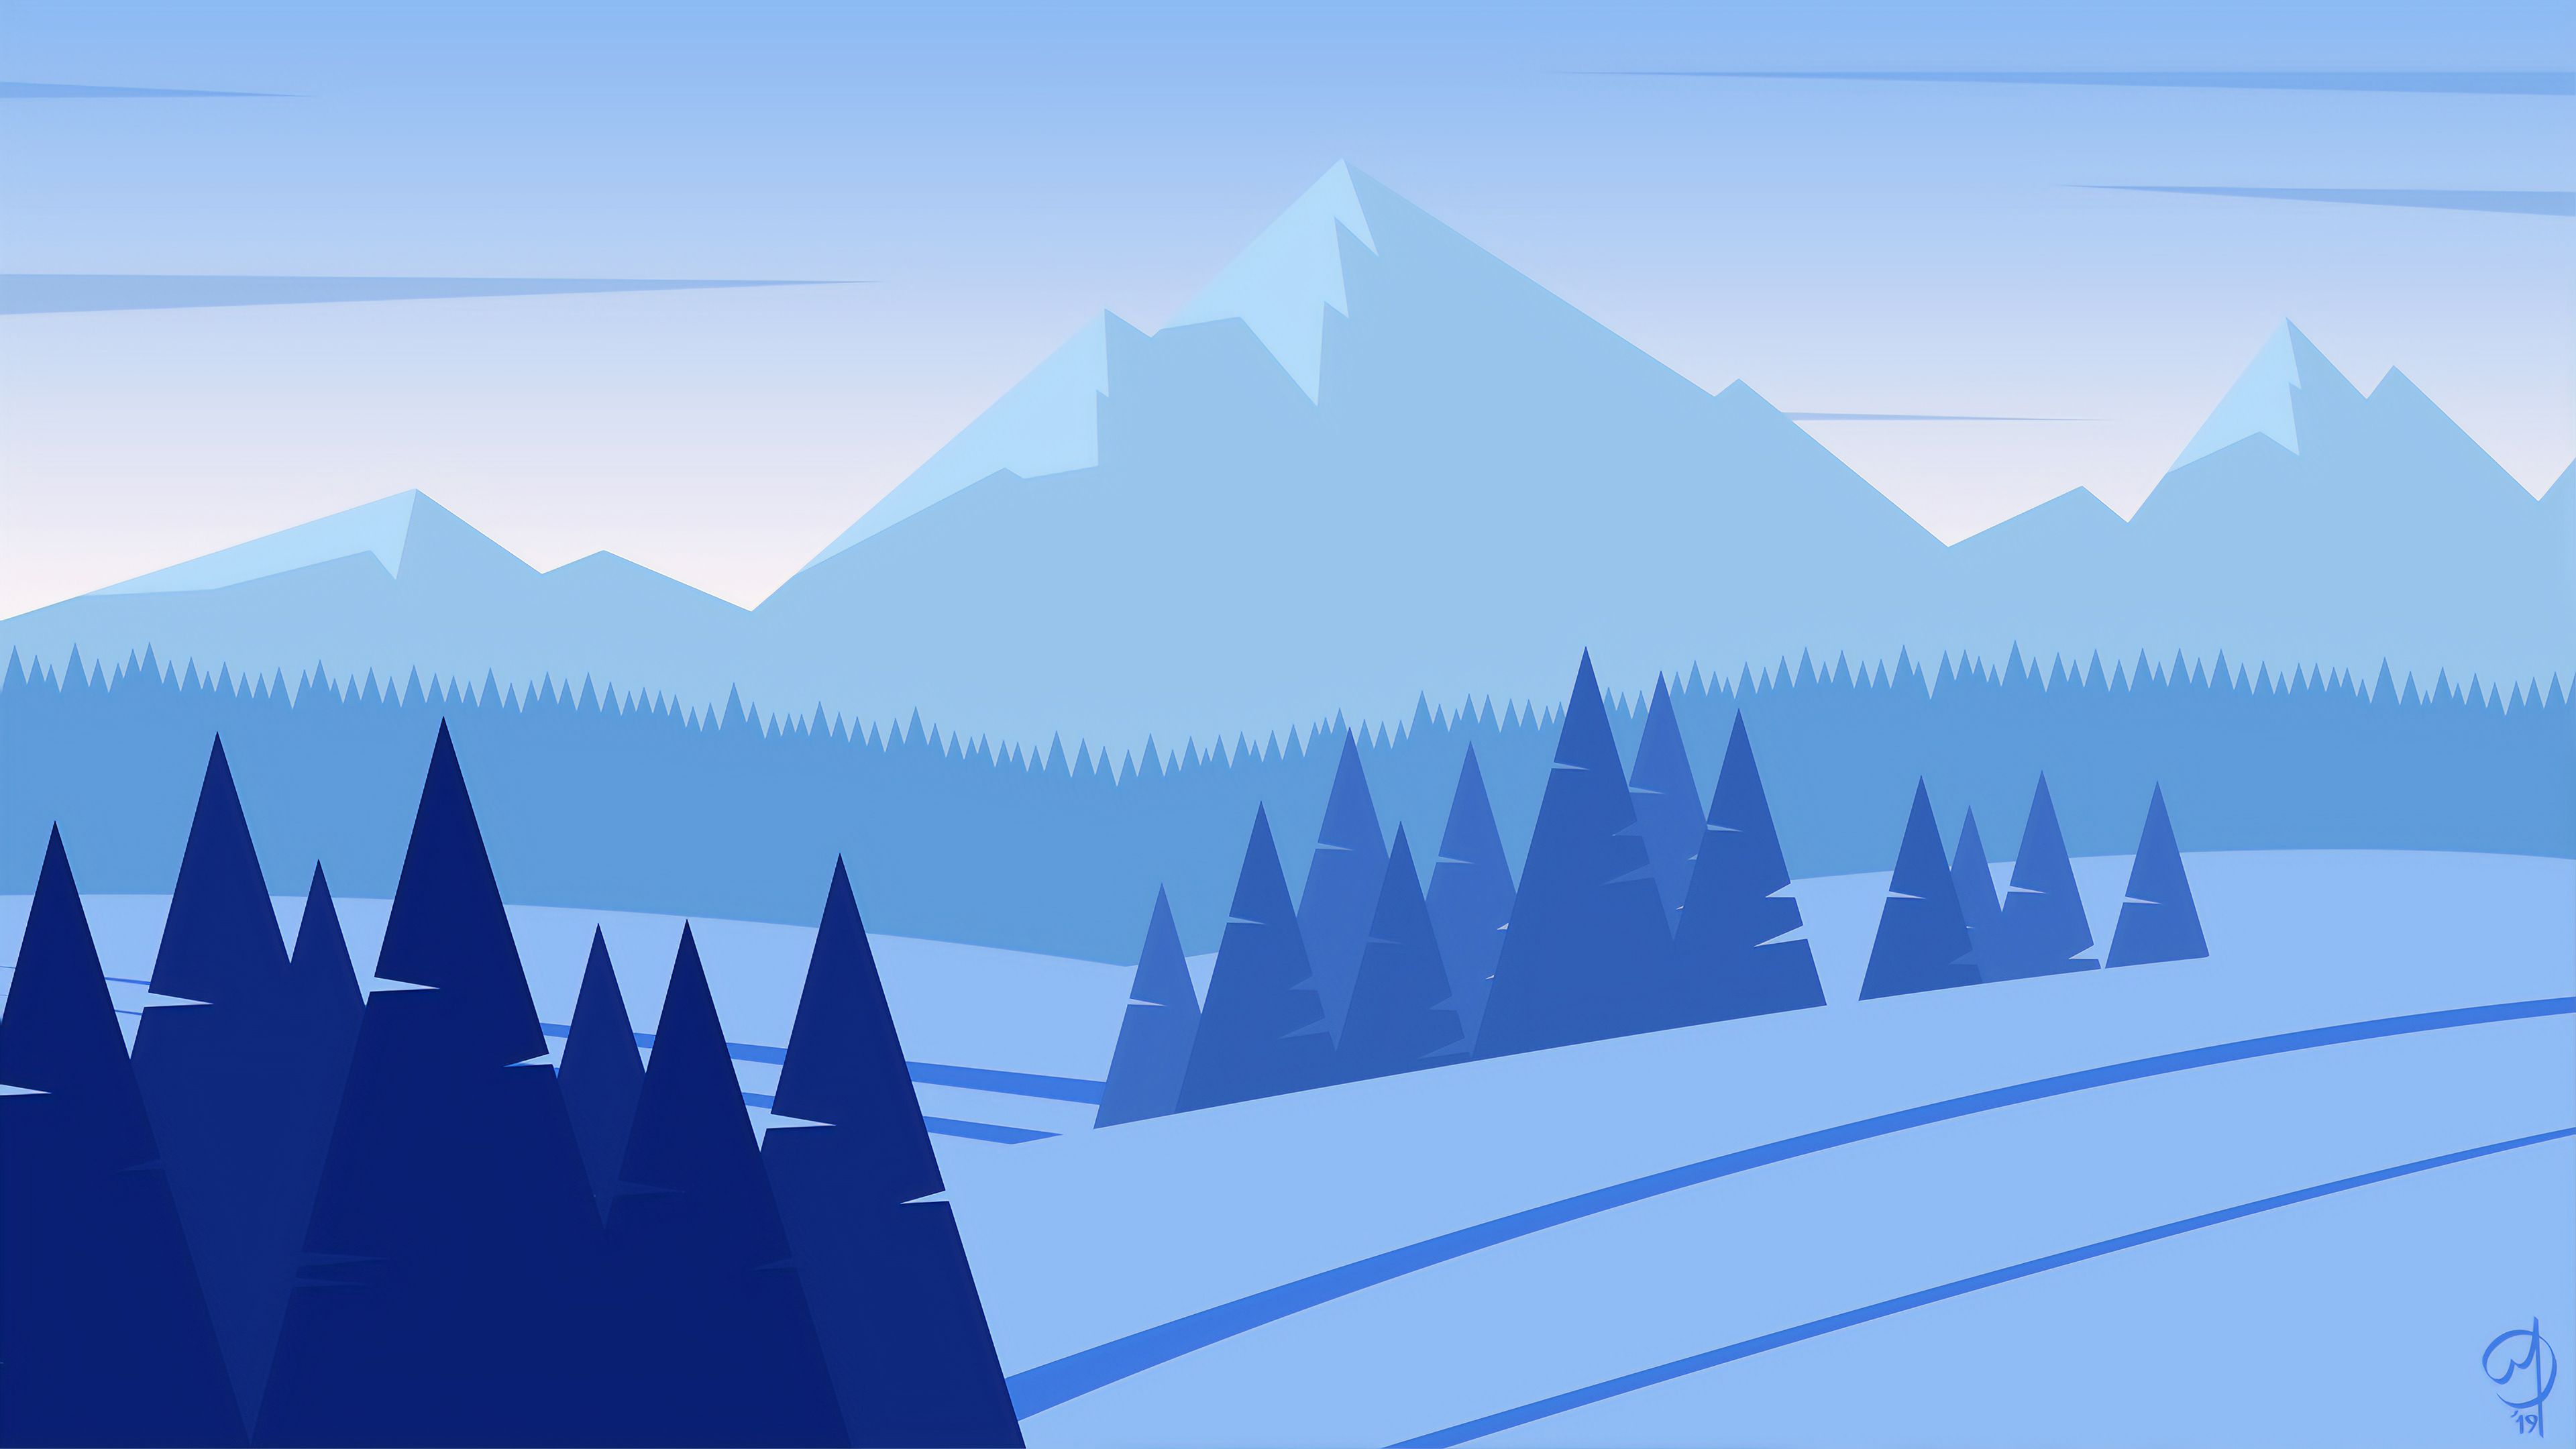 Snow Minimalist Wallpapers - Wallpaper Cave